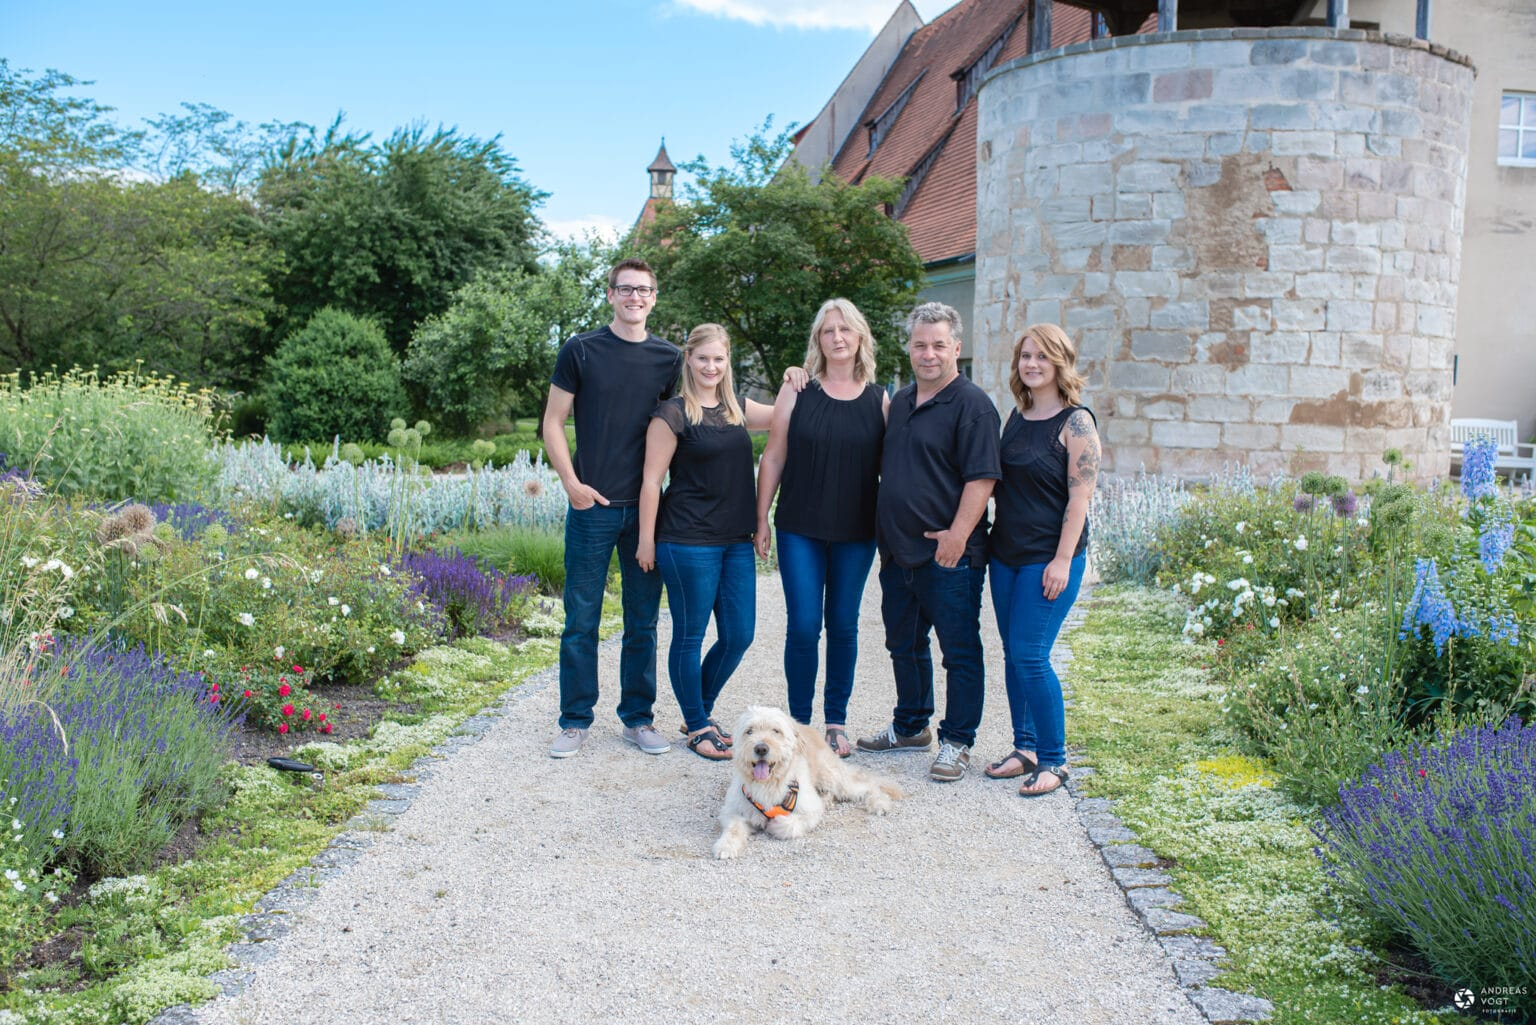 Fotoshooting Familie Ellwangen 02 Andreas Vogt Fotografie